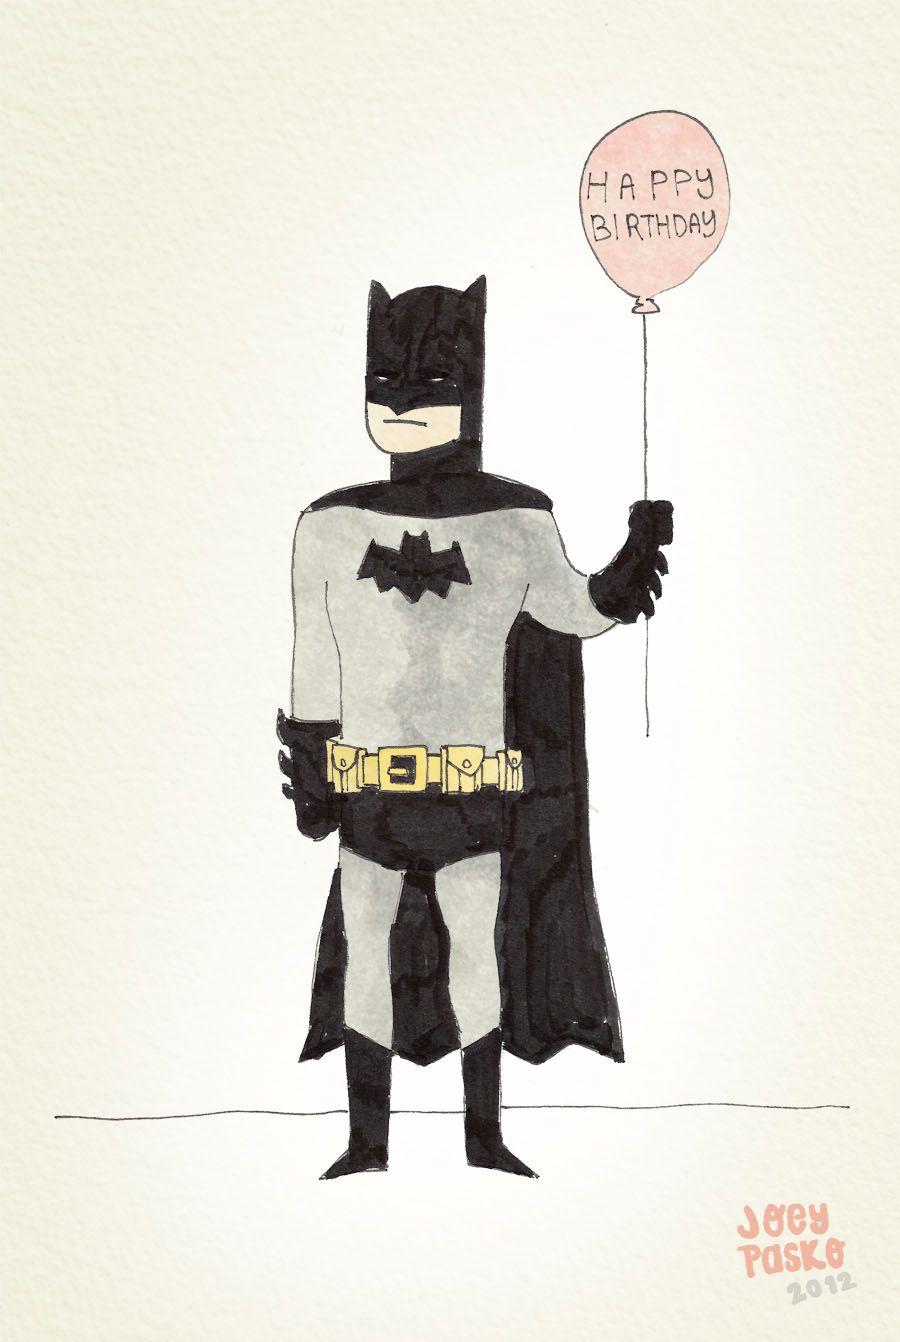 Юбилеем, открытки бэтмен с днем рождения